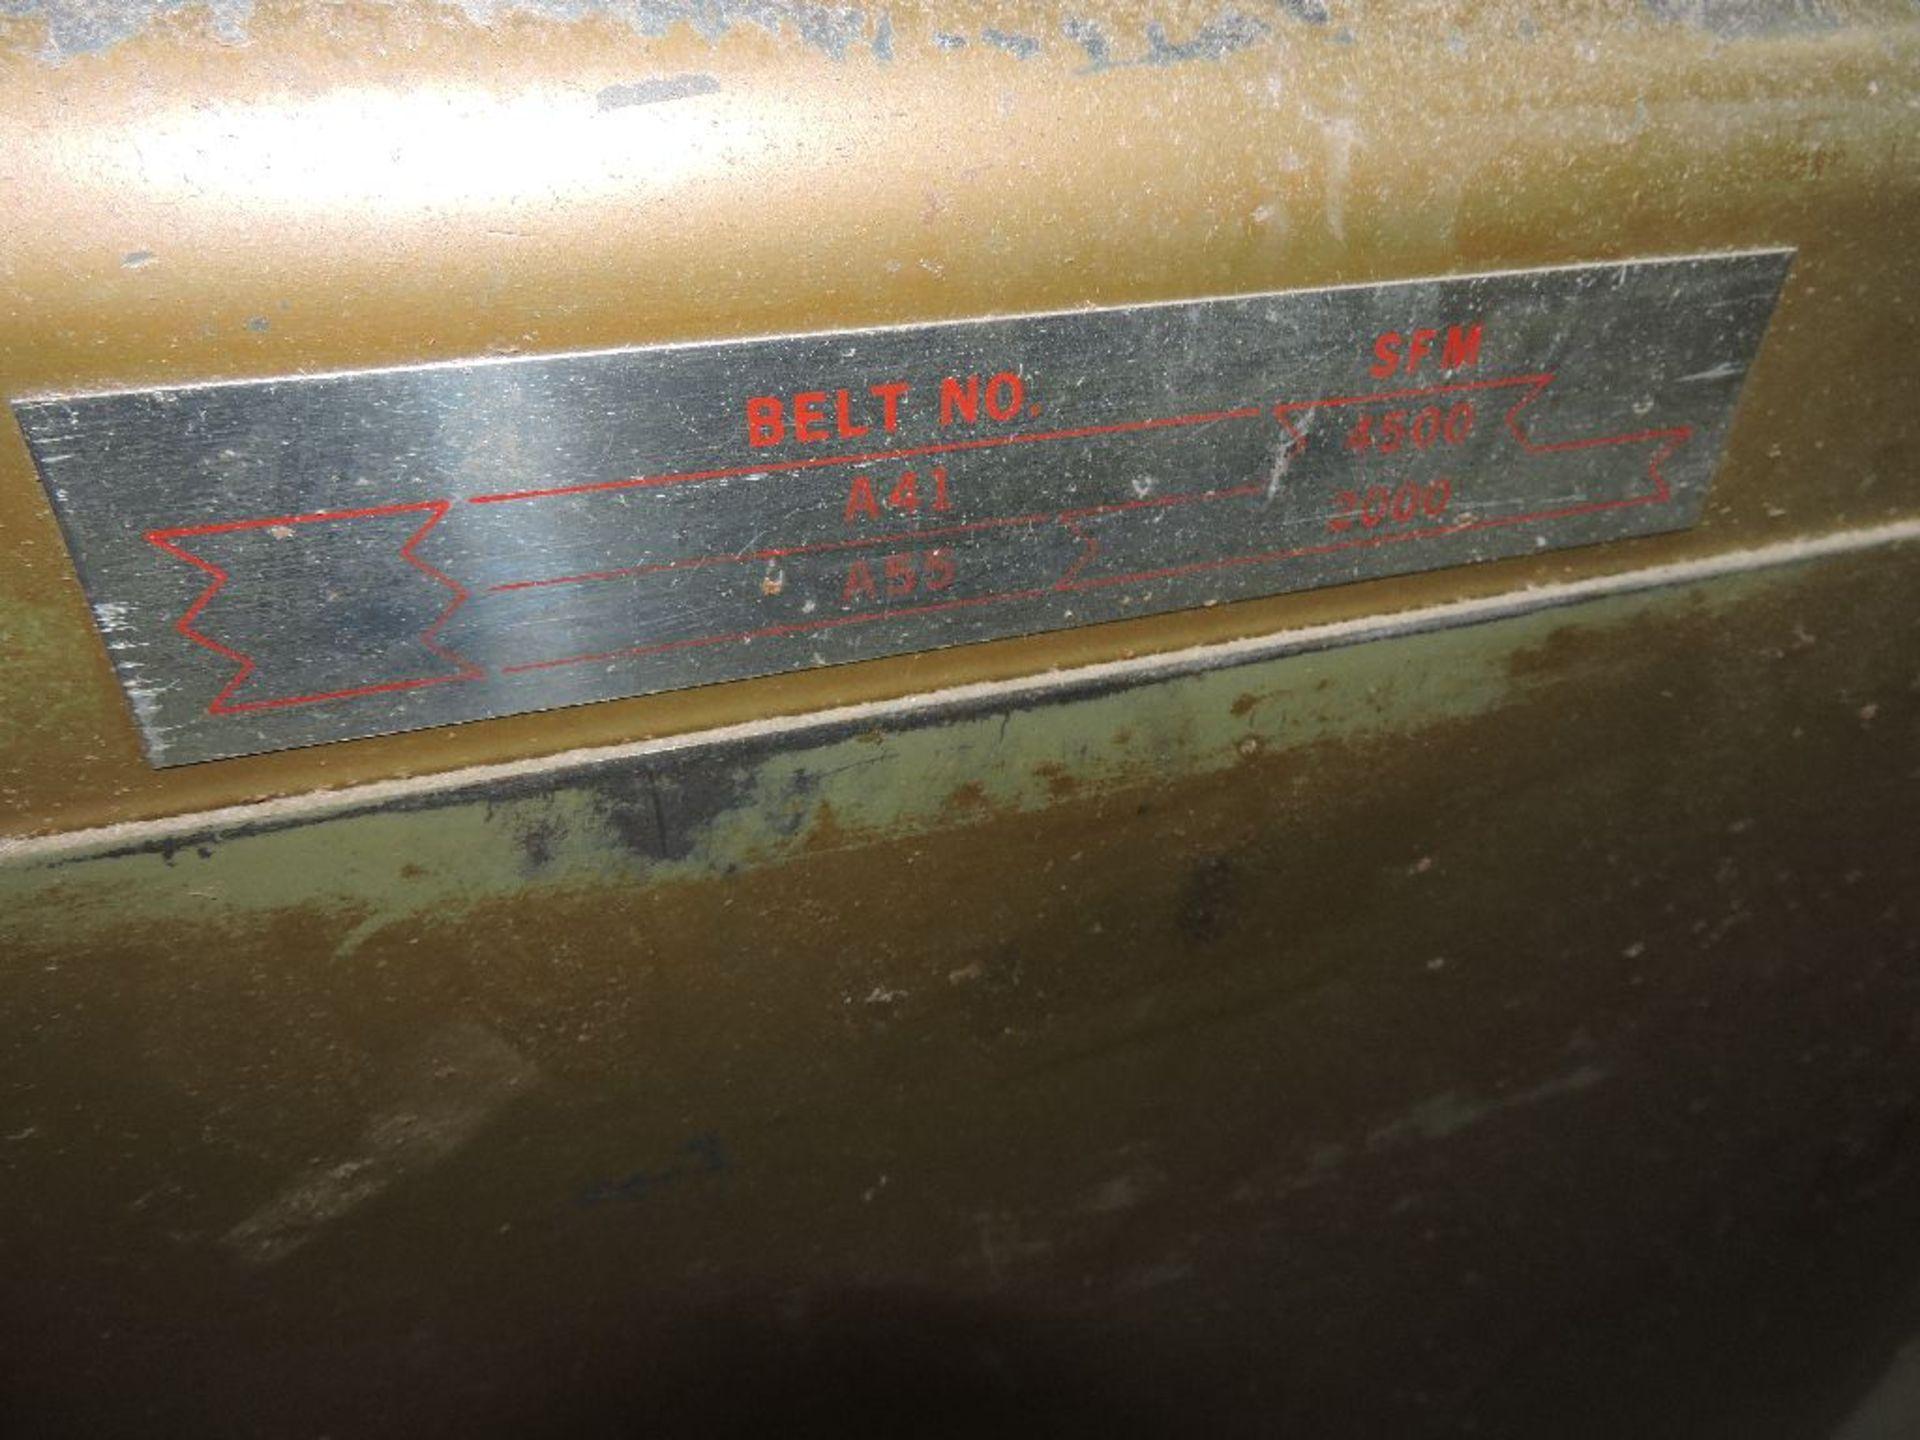 "Lot 025 - Powermatic bandsaw, model 81, sn 9481049, 20"", voltage 230/460."